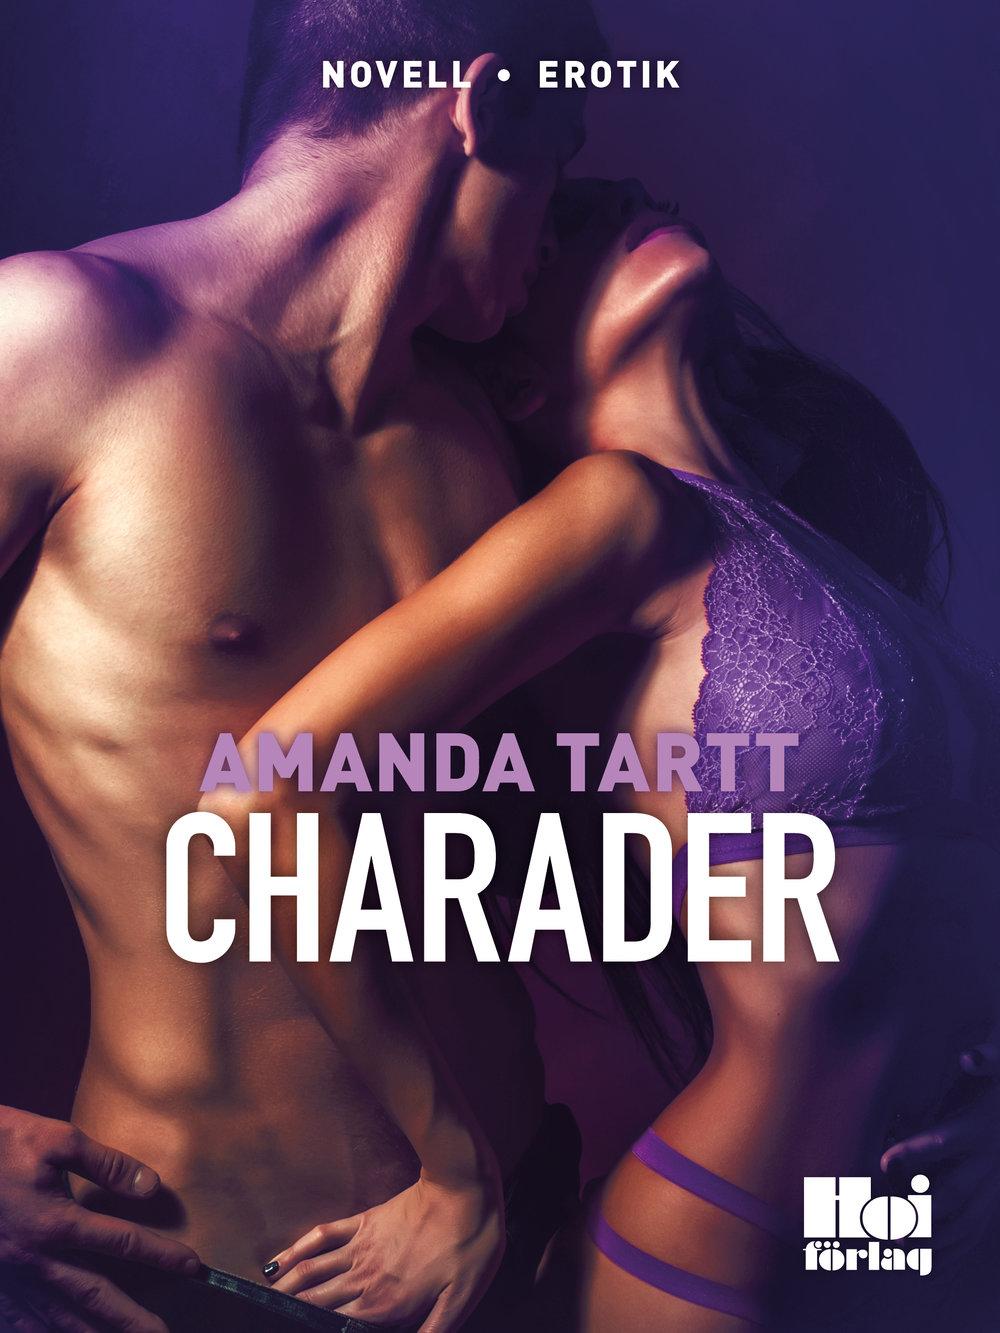 E-bok Charader av Amanda Tartt